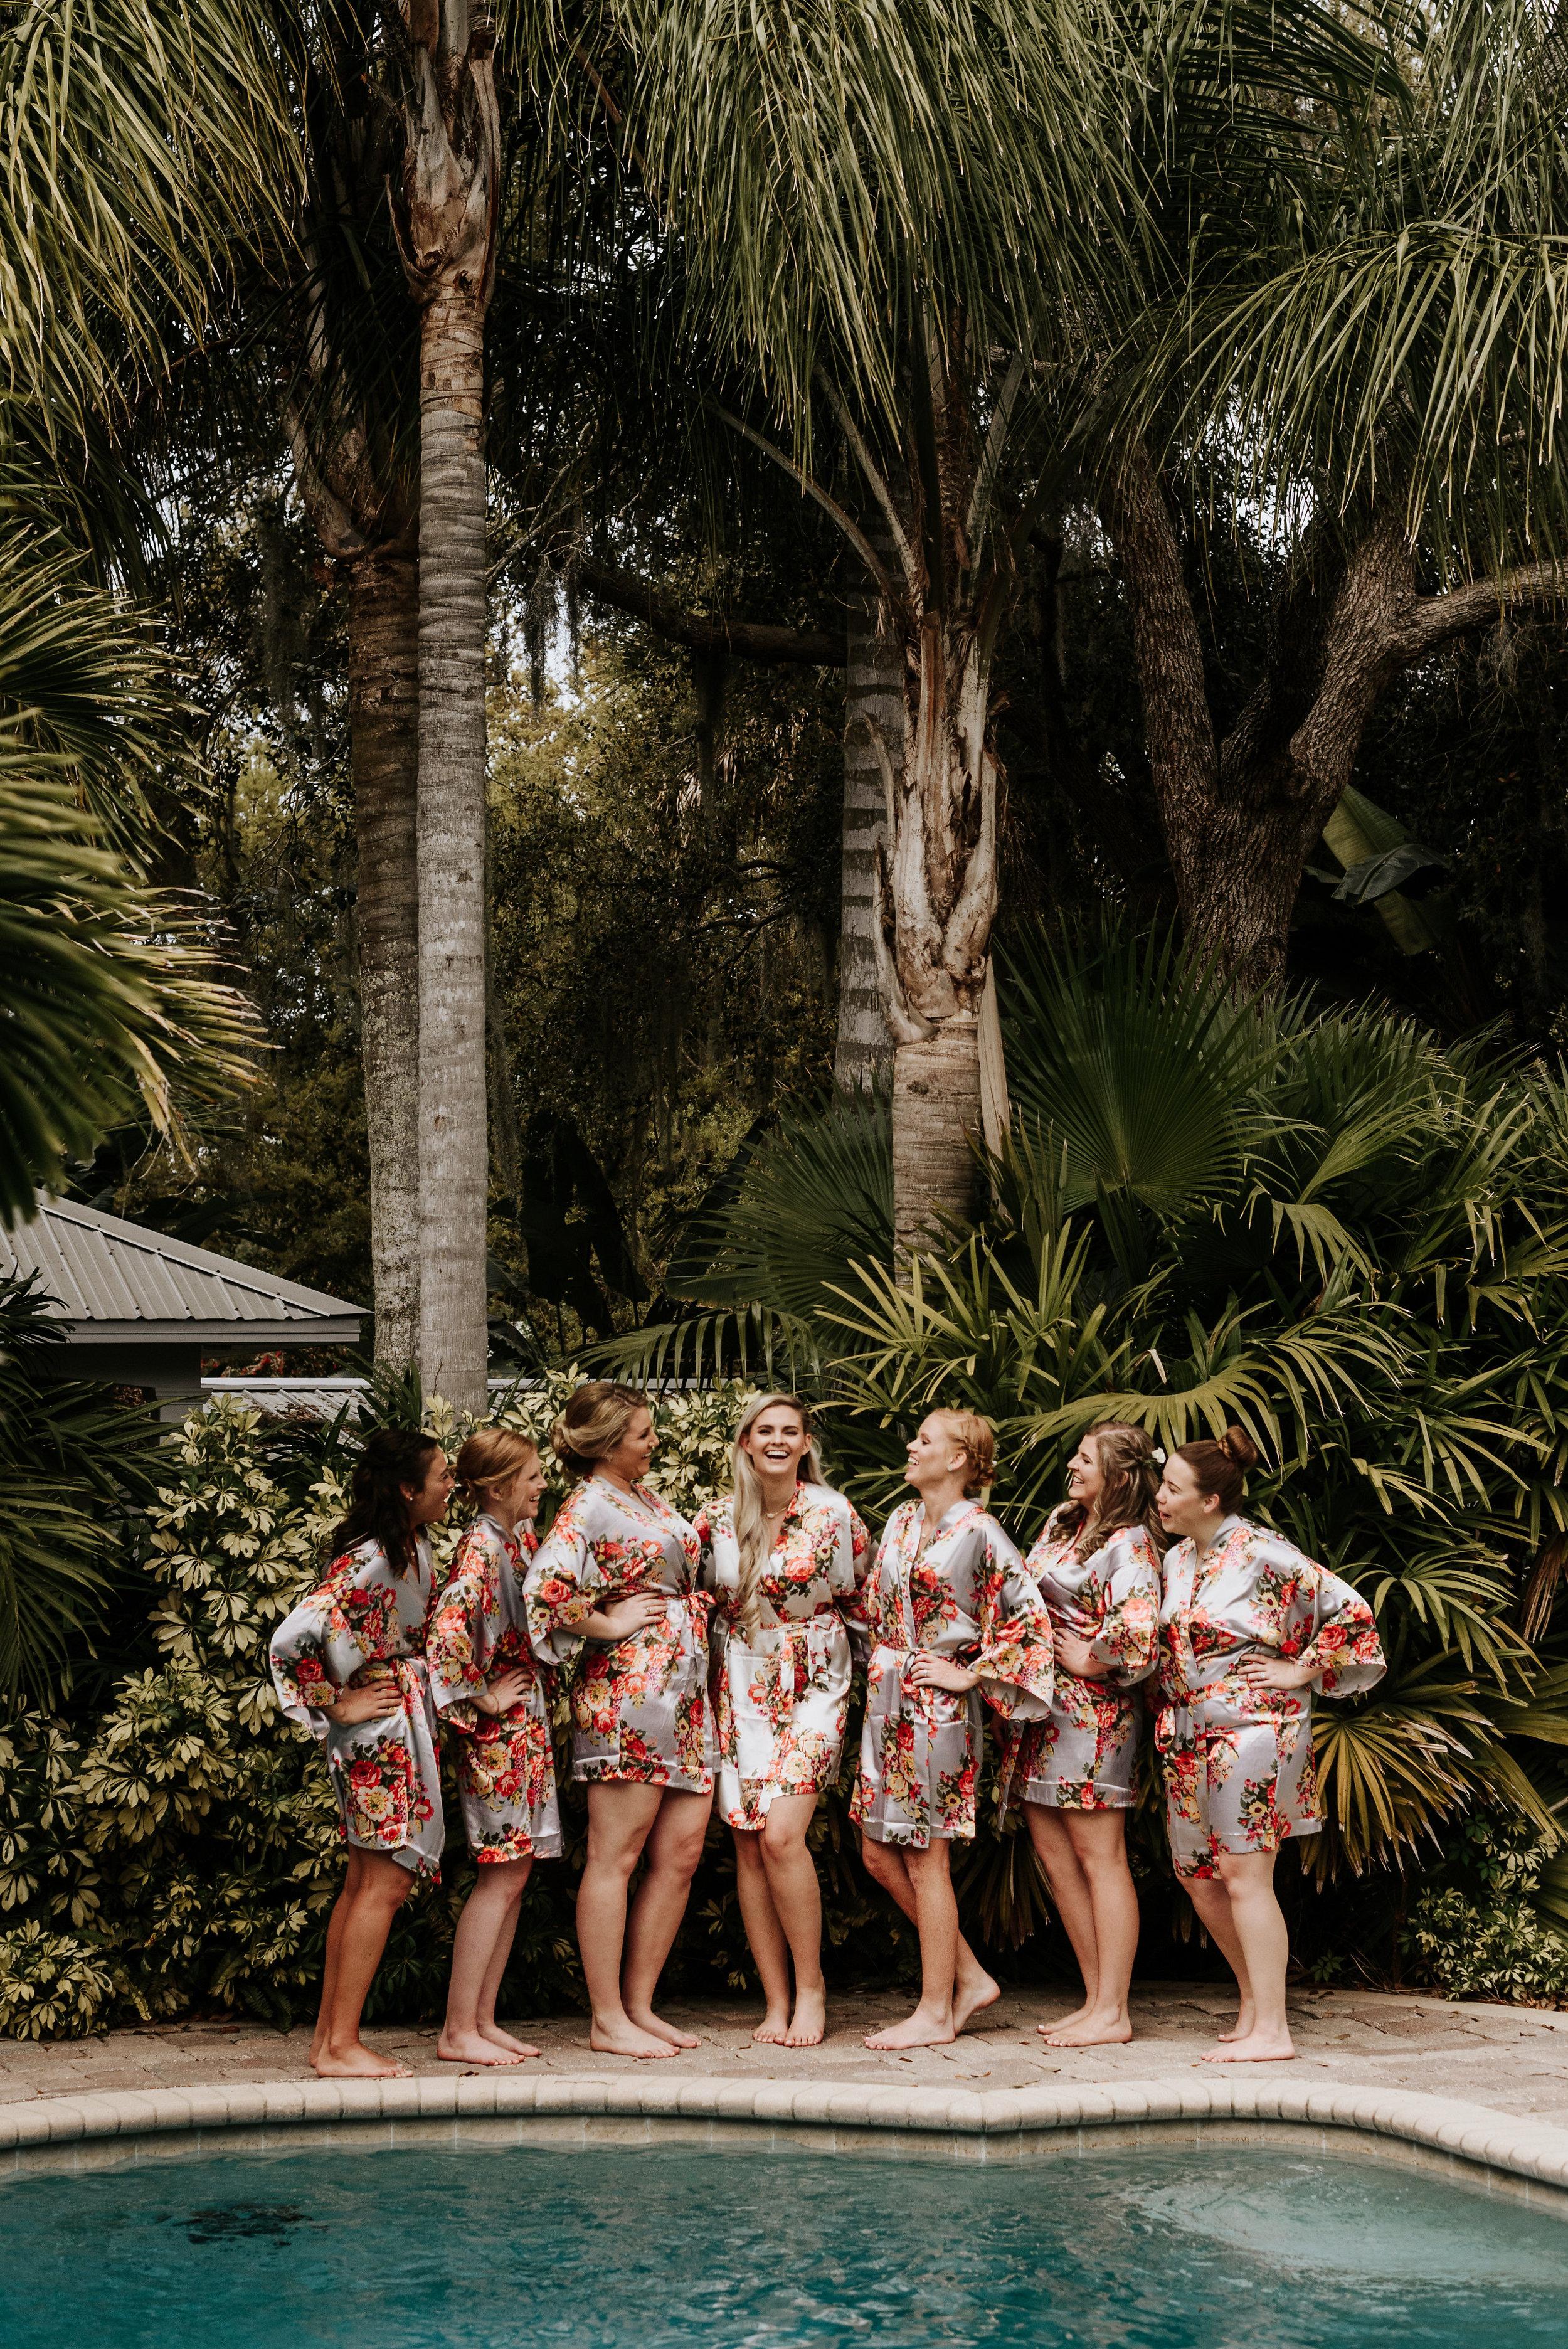 Mikenzi_Brad_Wedding_The_Delamater_House_New_Smyrna_Beach_Florida_Photography_by_V_4330.jpg